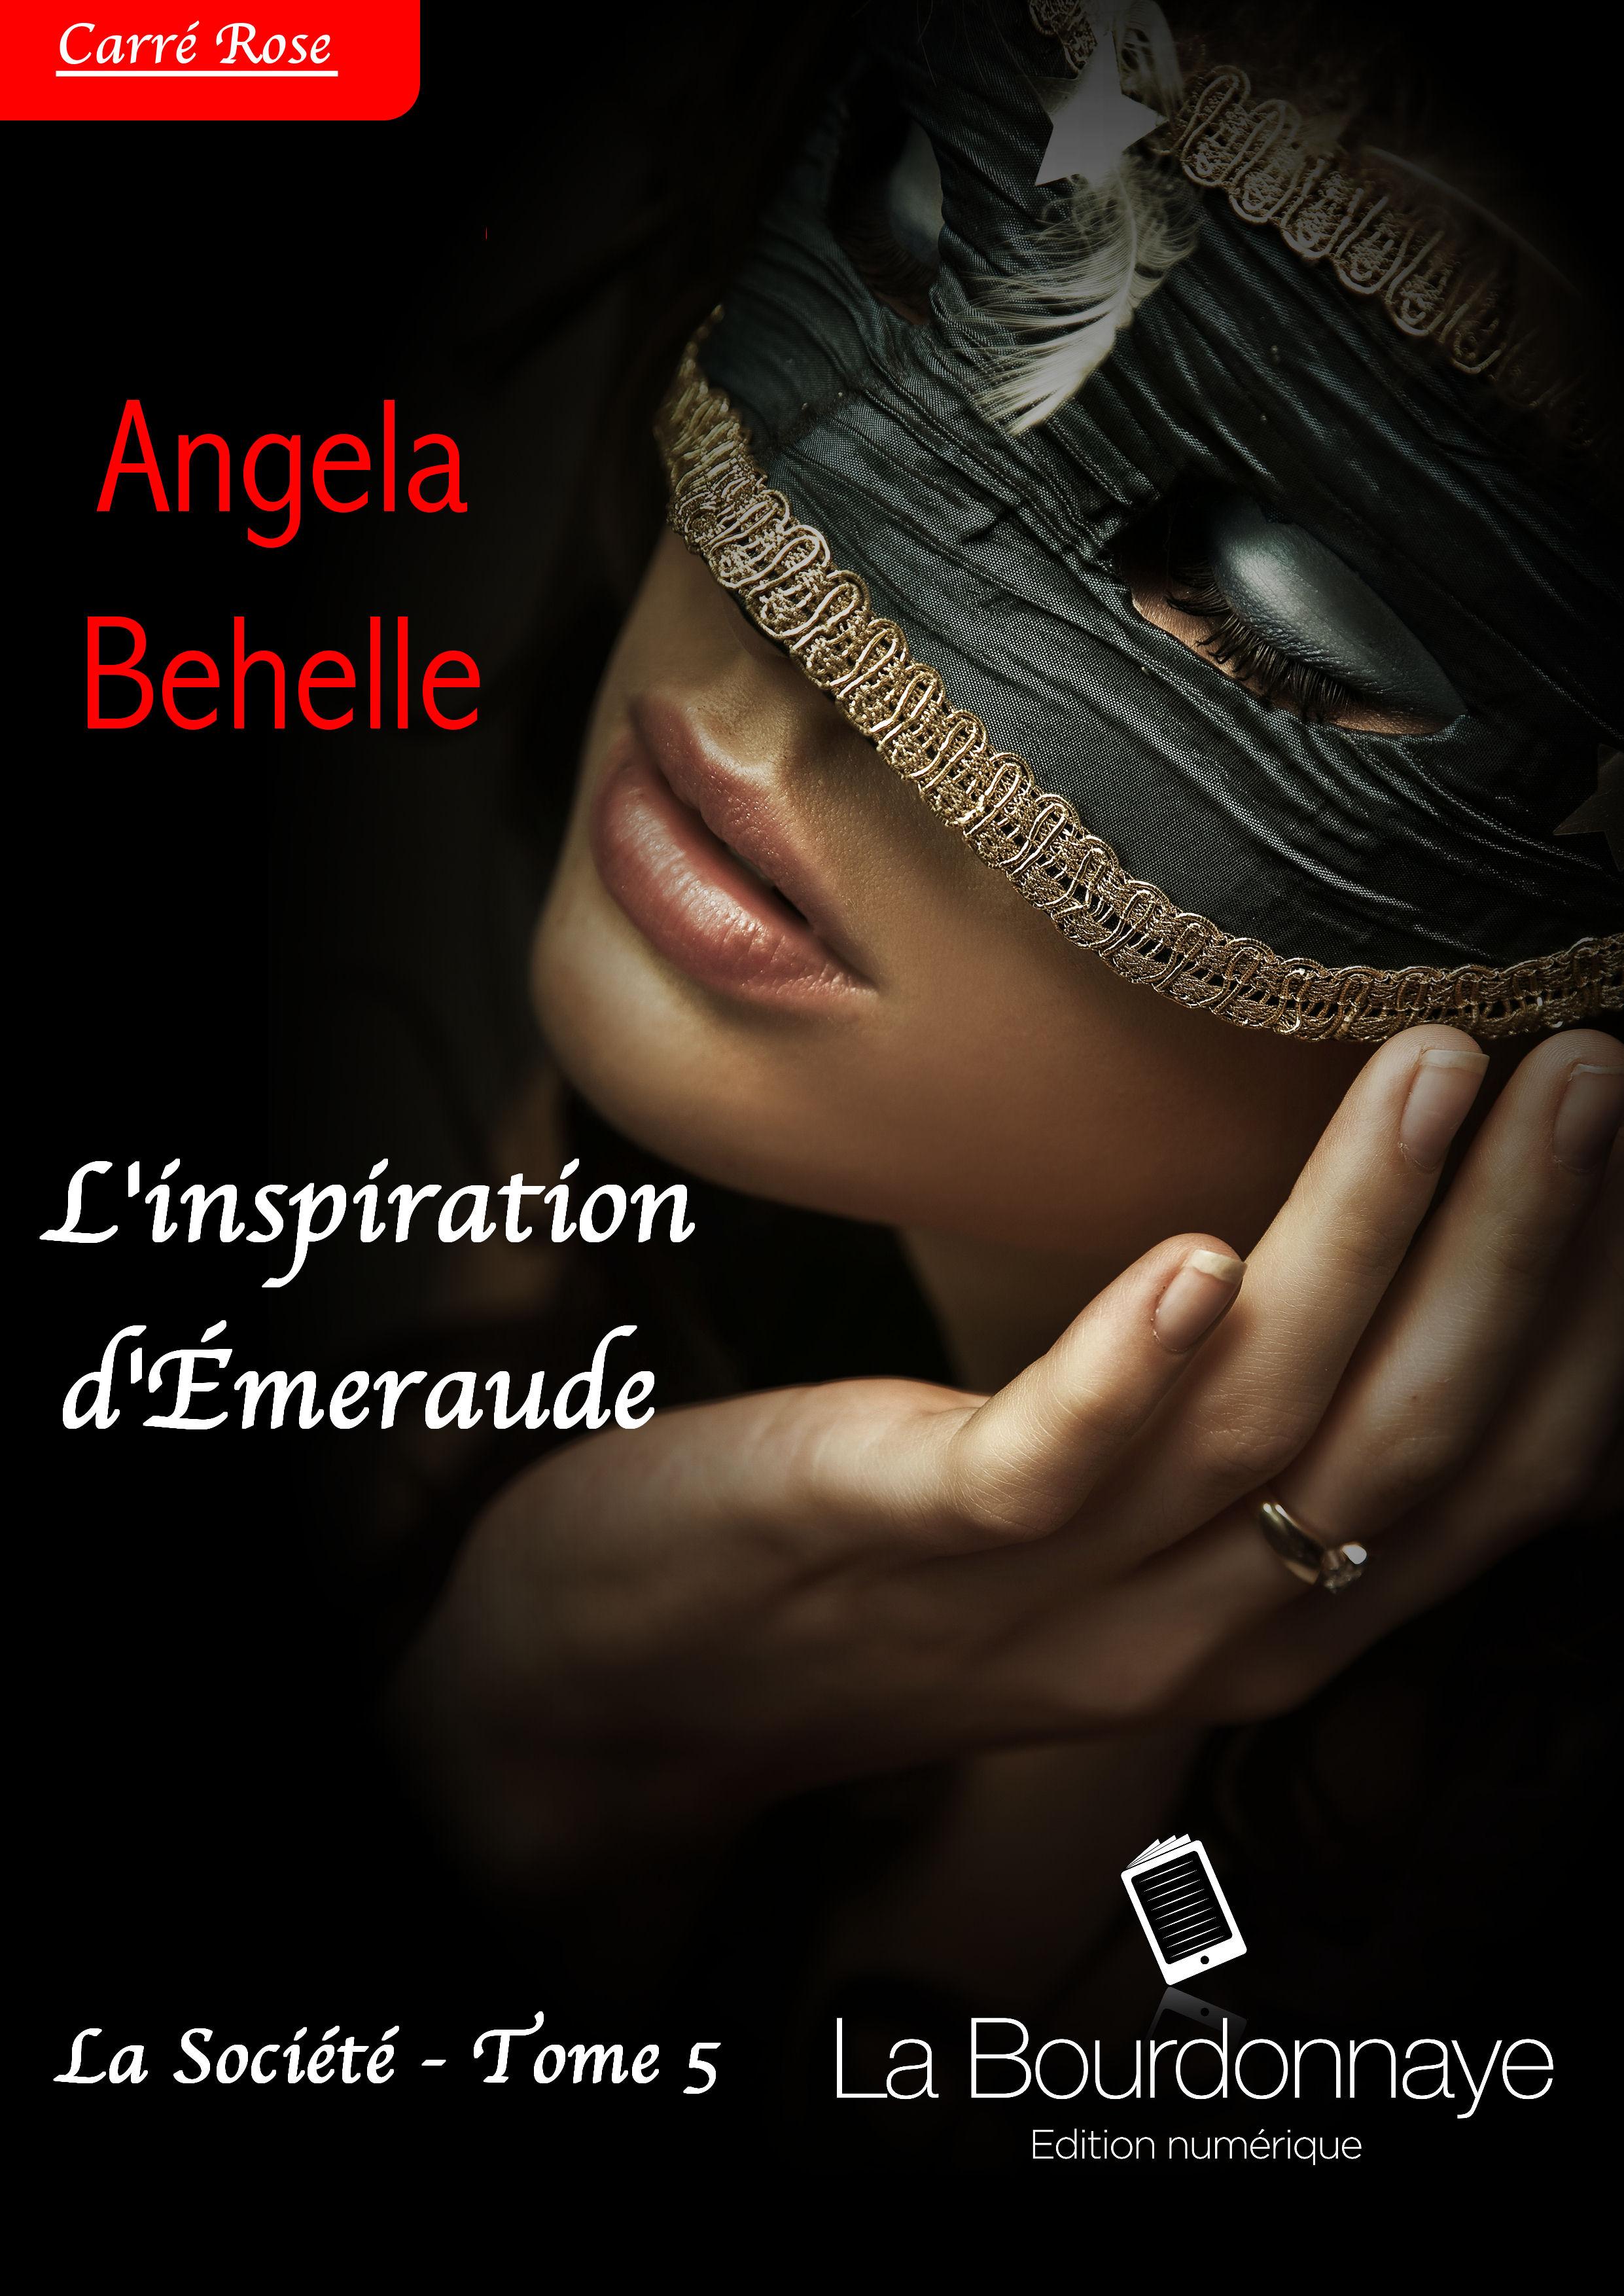 http://angelabehelle.files.wordpress.com/2013/05/tome5.jpg